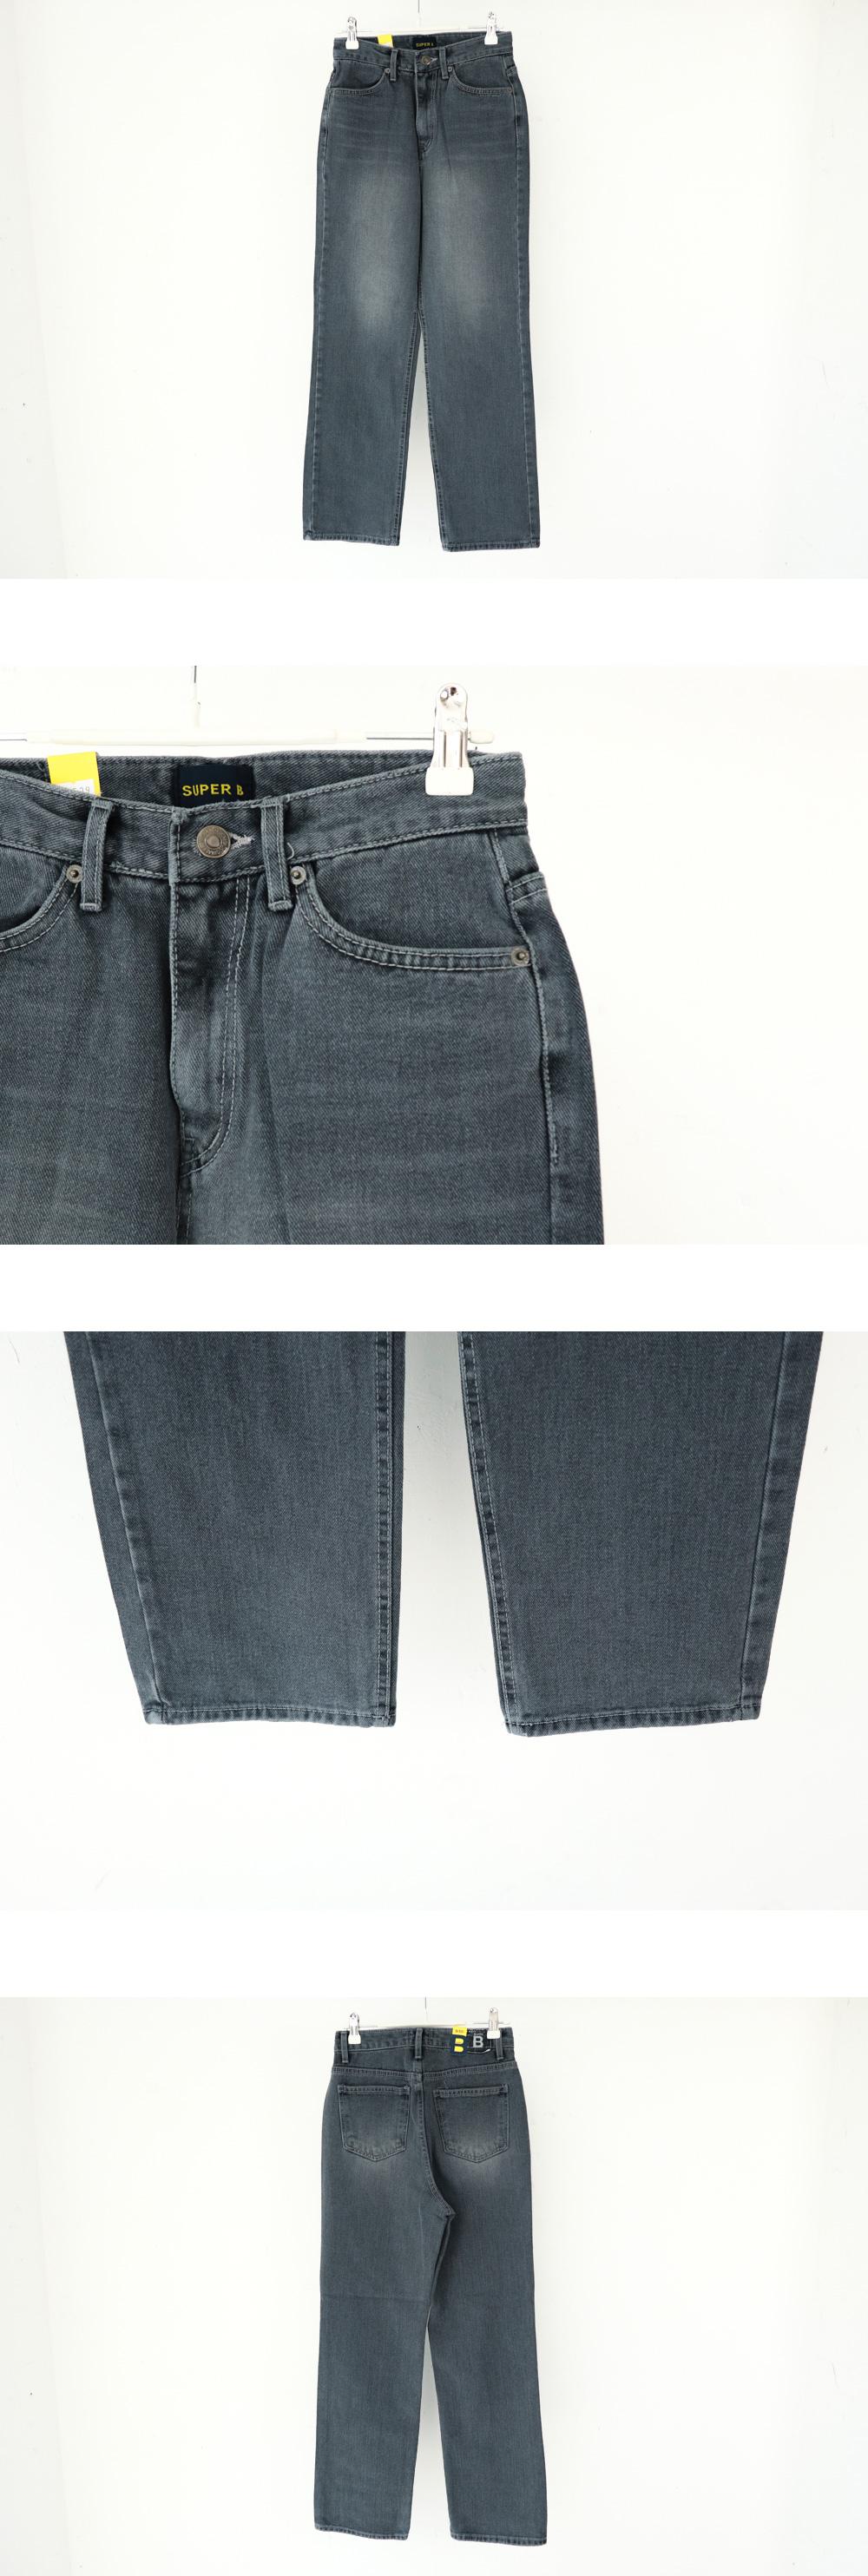 7529 dark gray washed denim pants